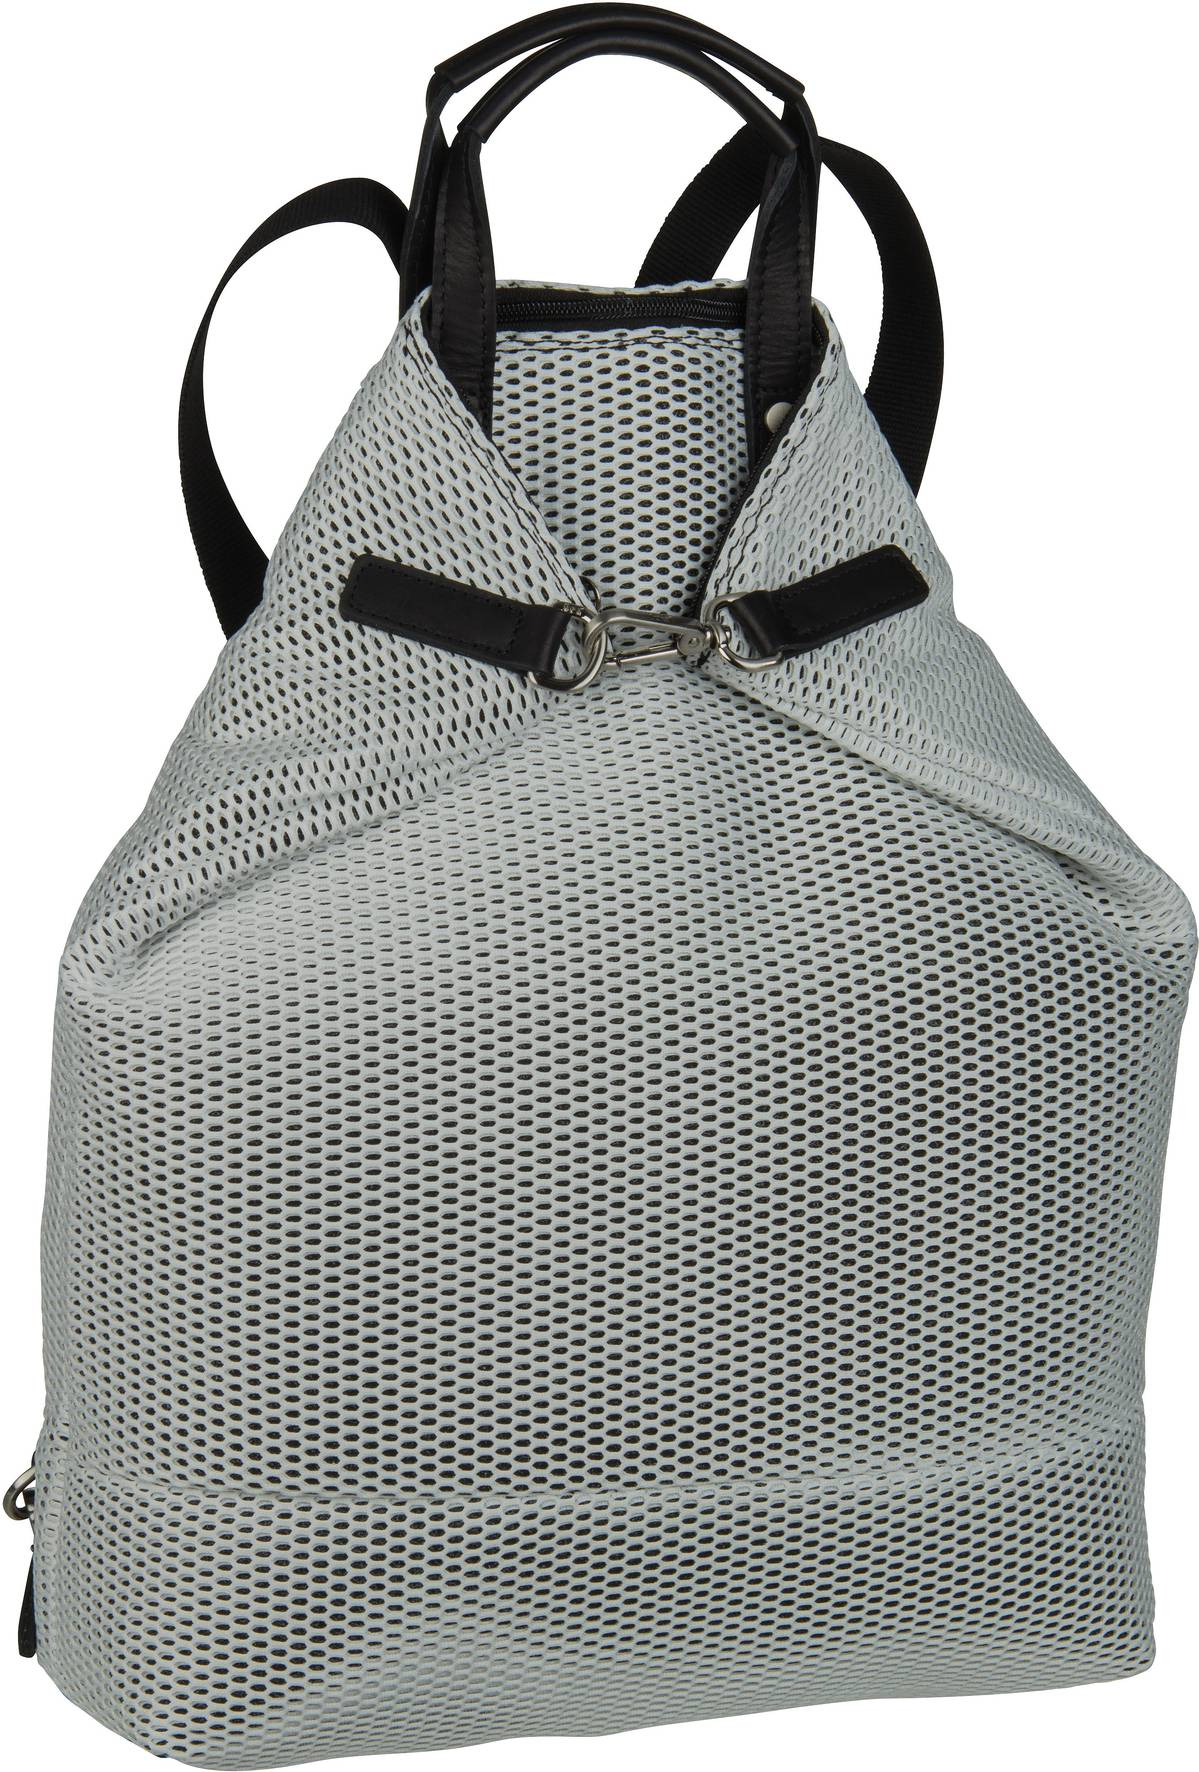 Rucksack / Daypack Mesh 6170 X-Change 3in1 Bag M White